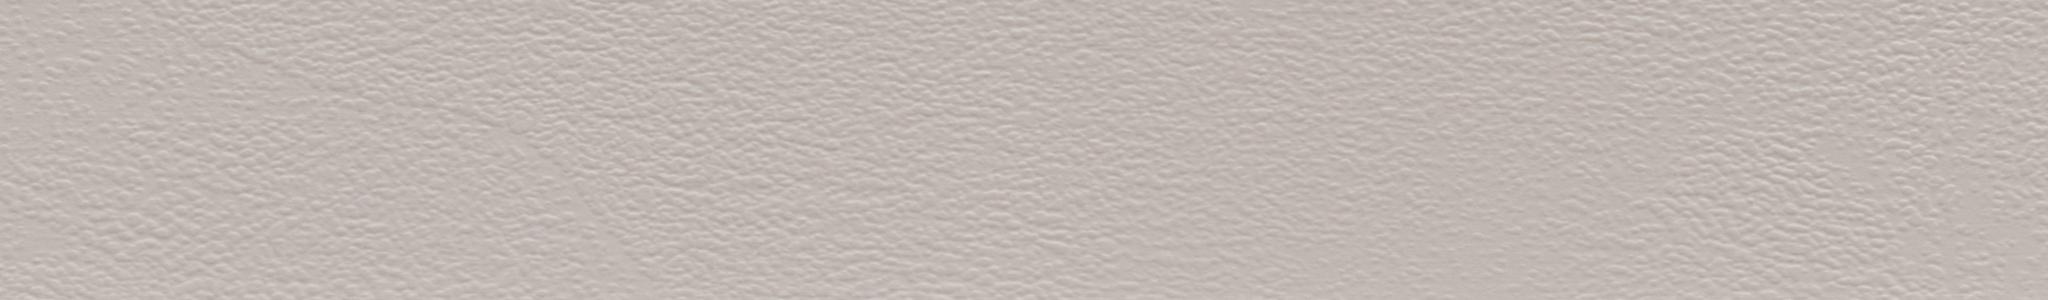 HU 129049 ABS Edge Cashmere Pearl XE